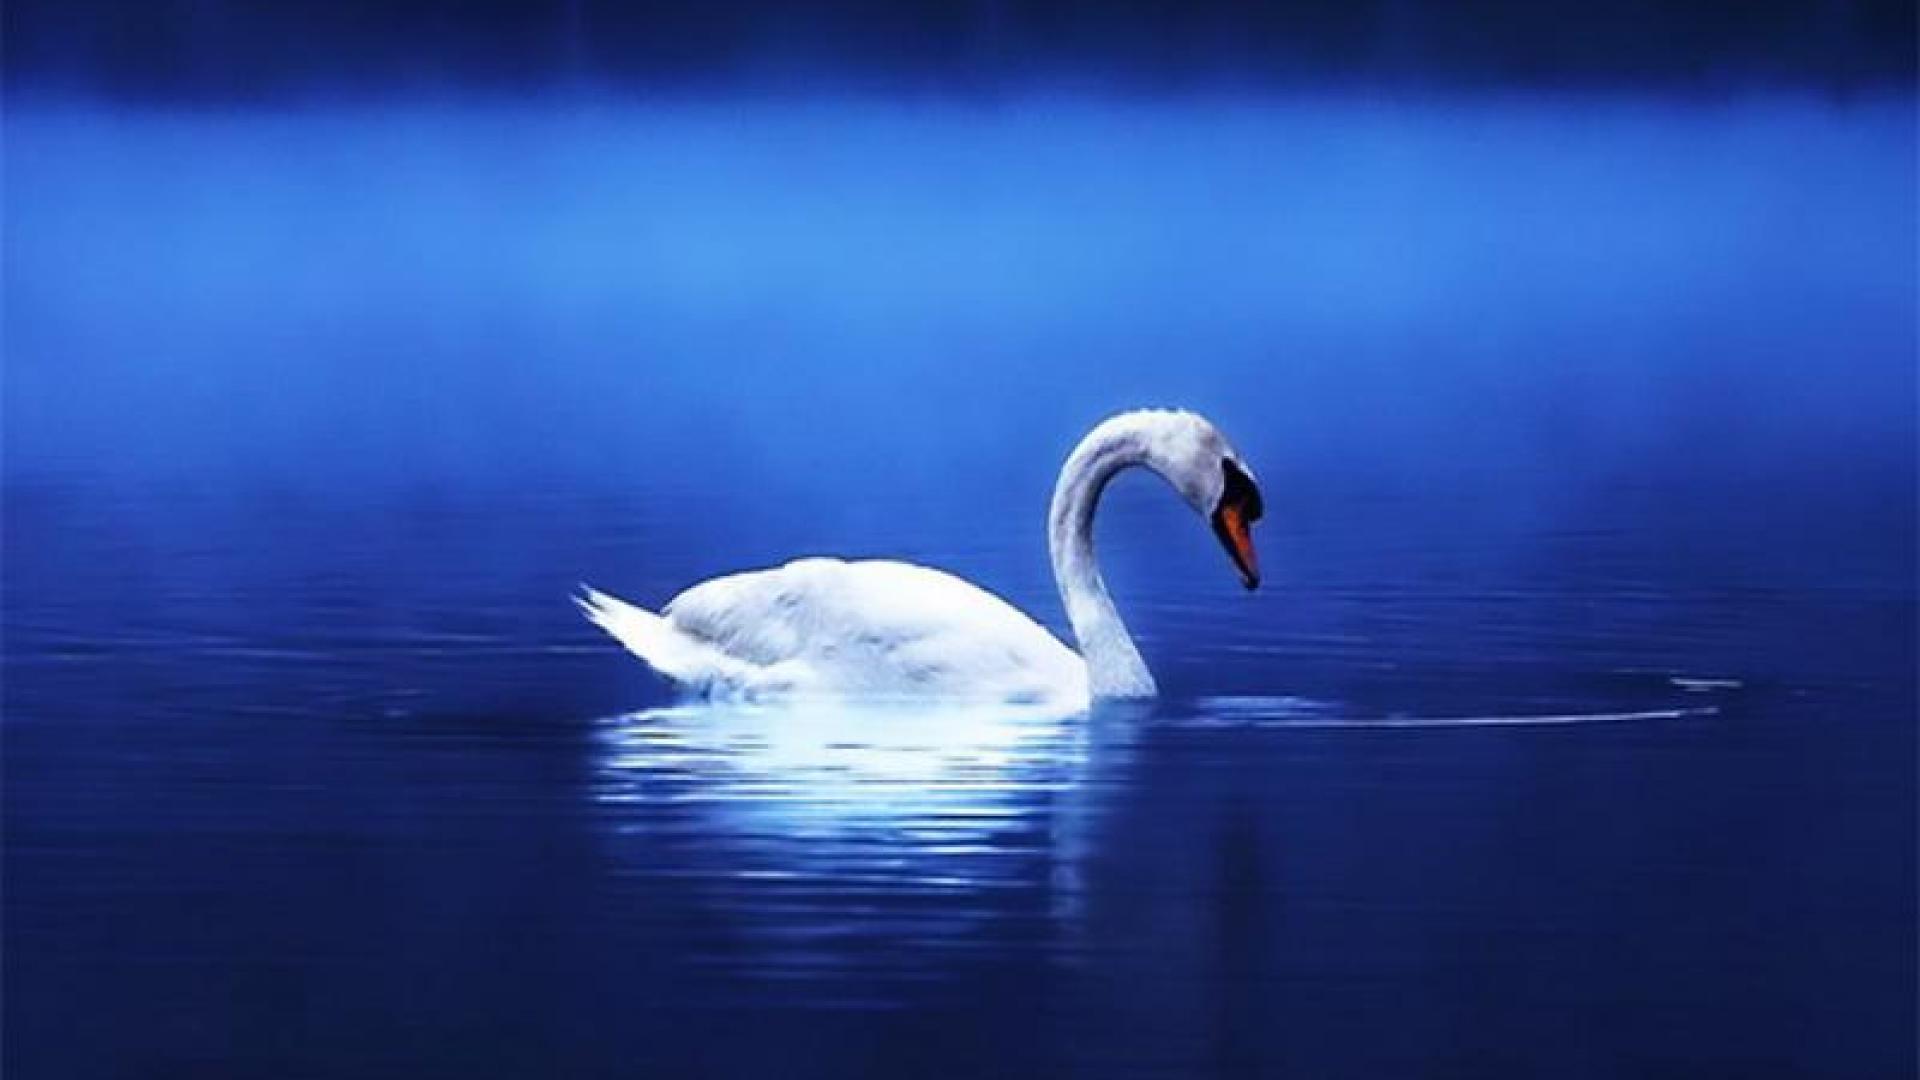 swan wallpaper HD 1920x1080